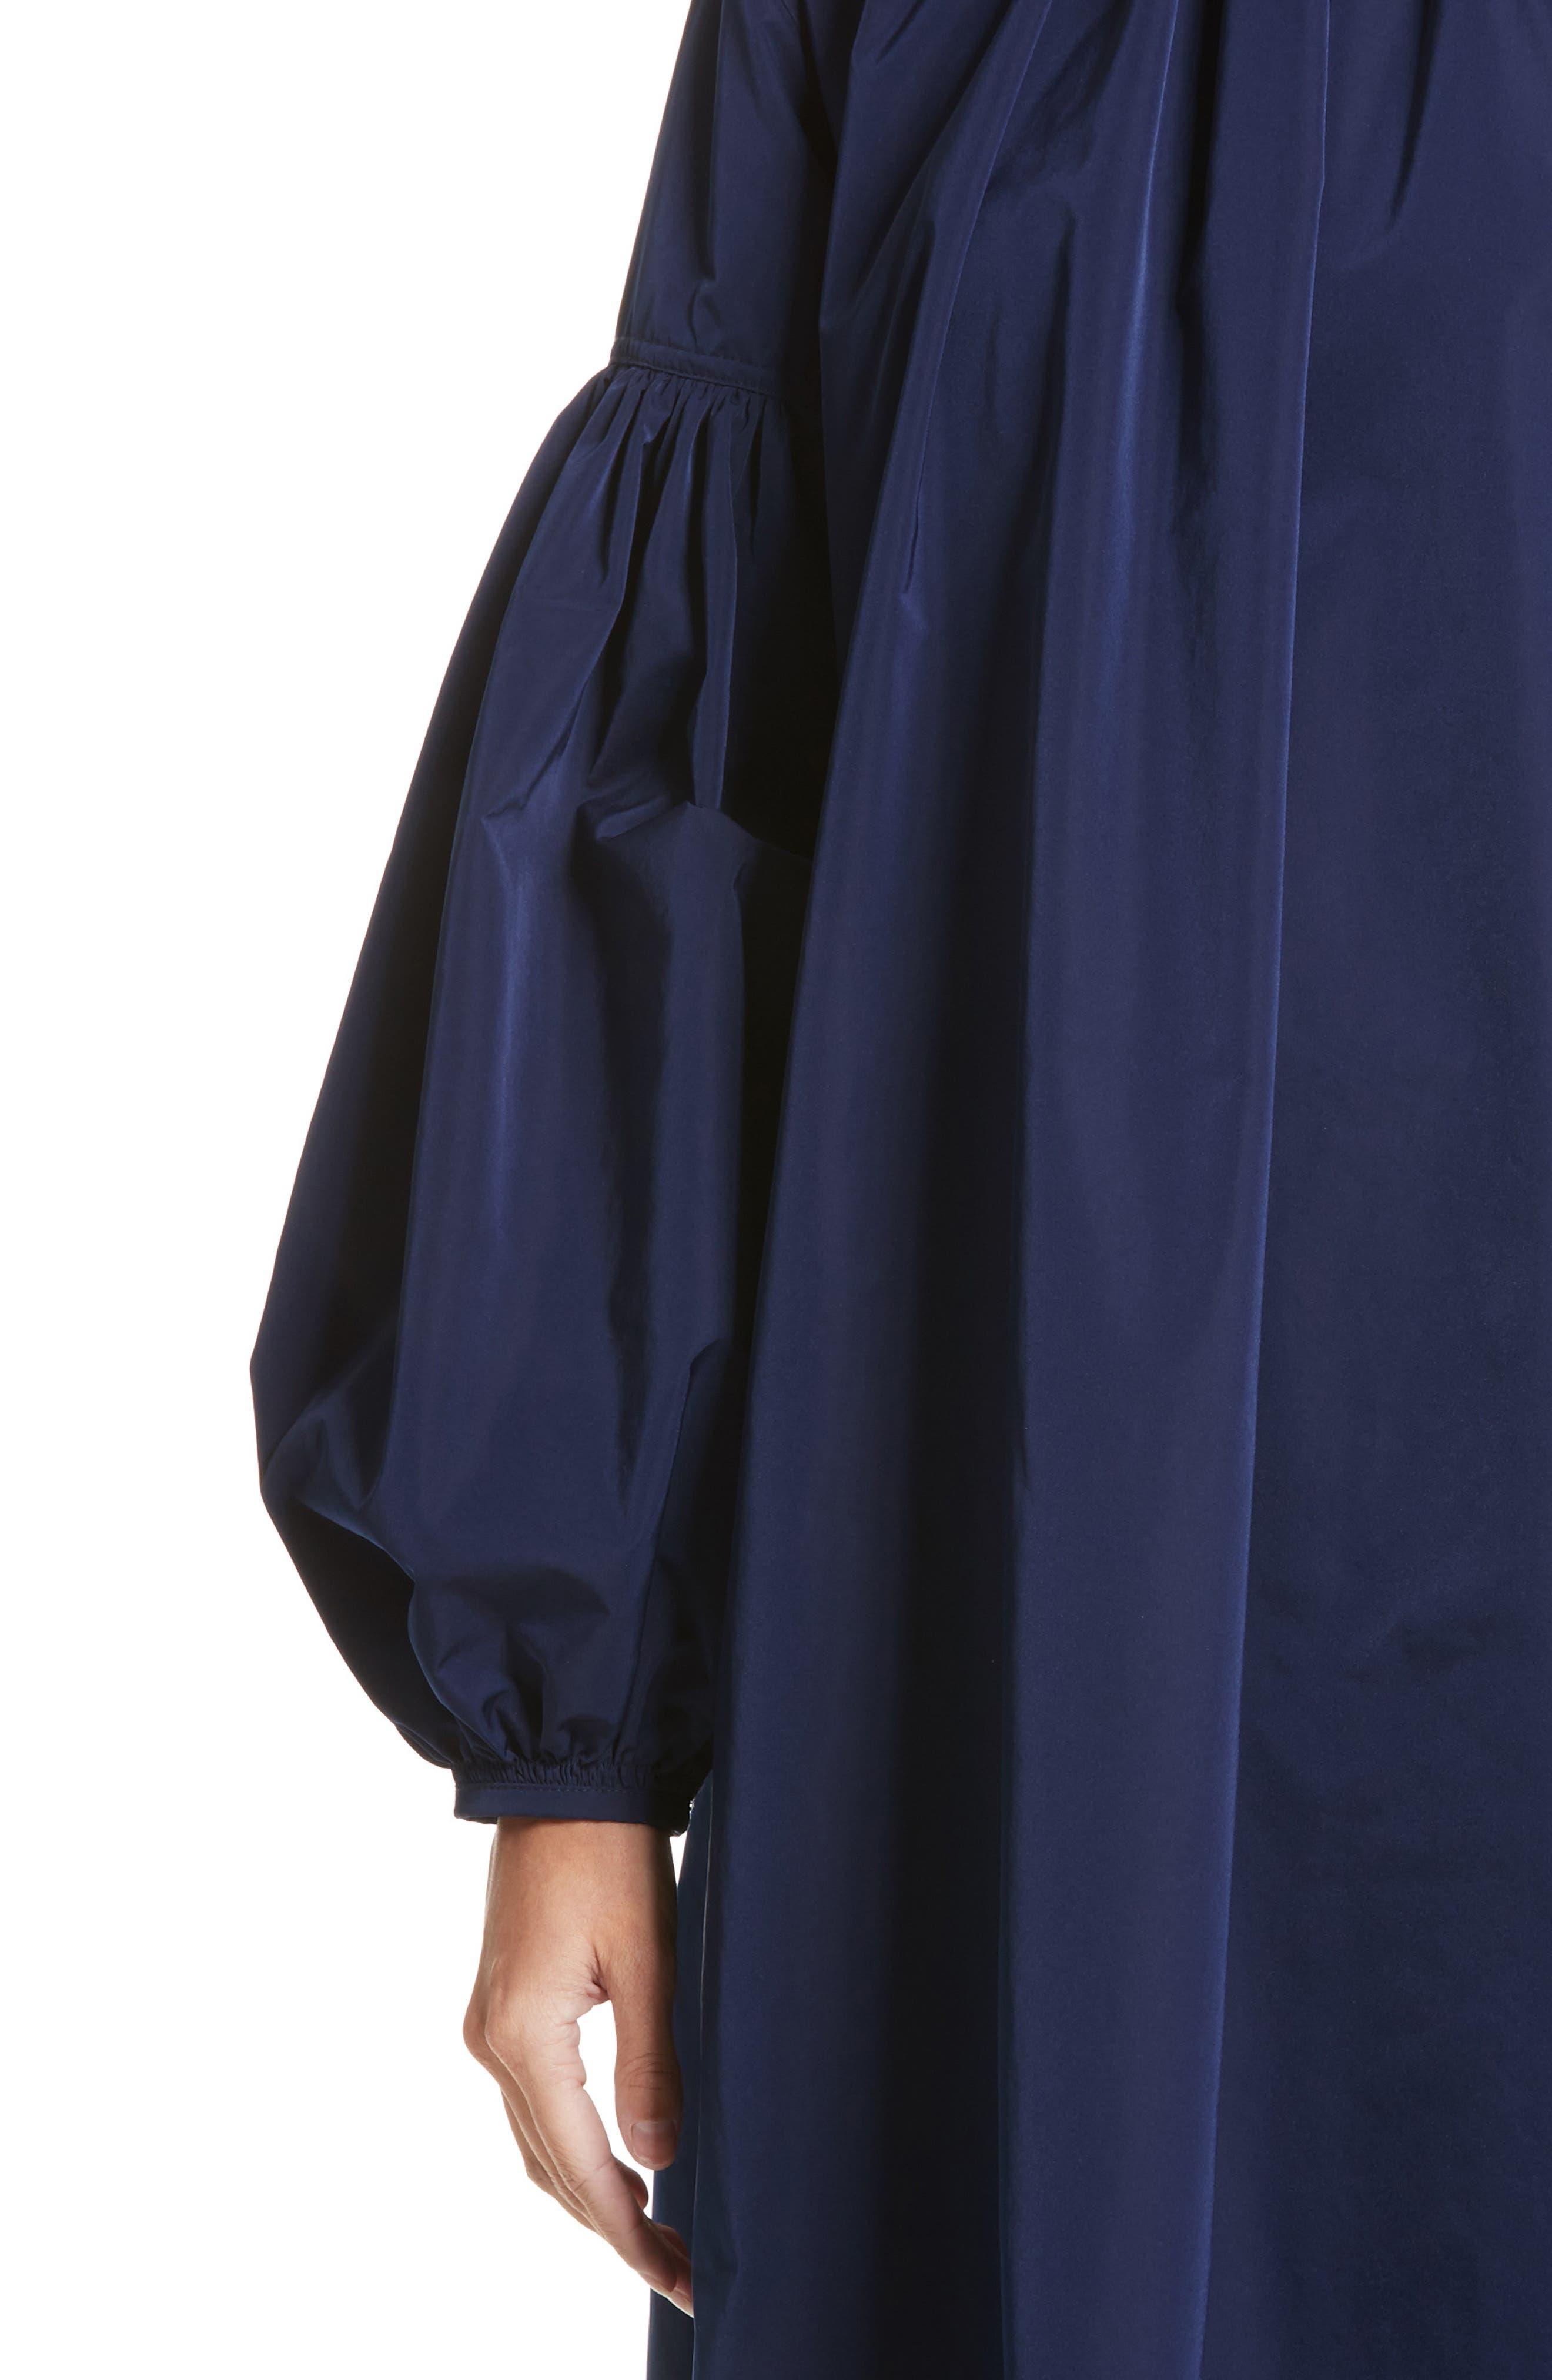 Ruched Sleeve Taffeta Dress,                             Alternate thumbnail 4, color,                             404